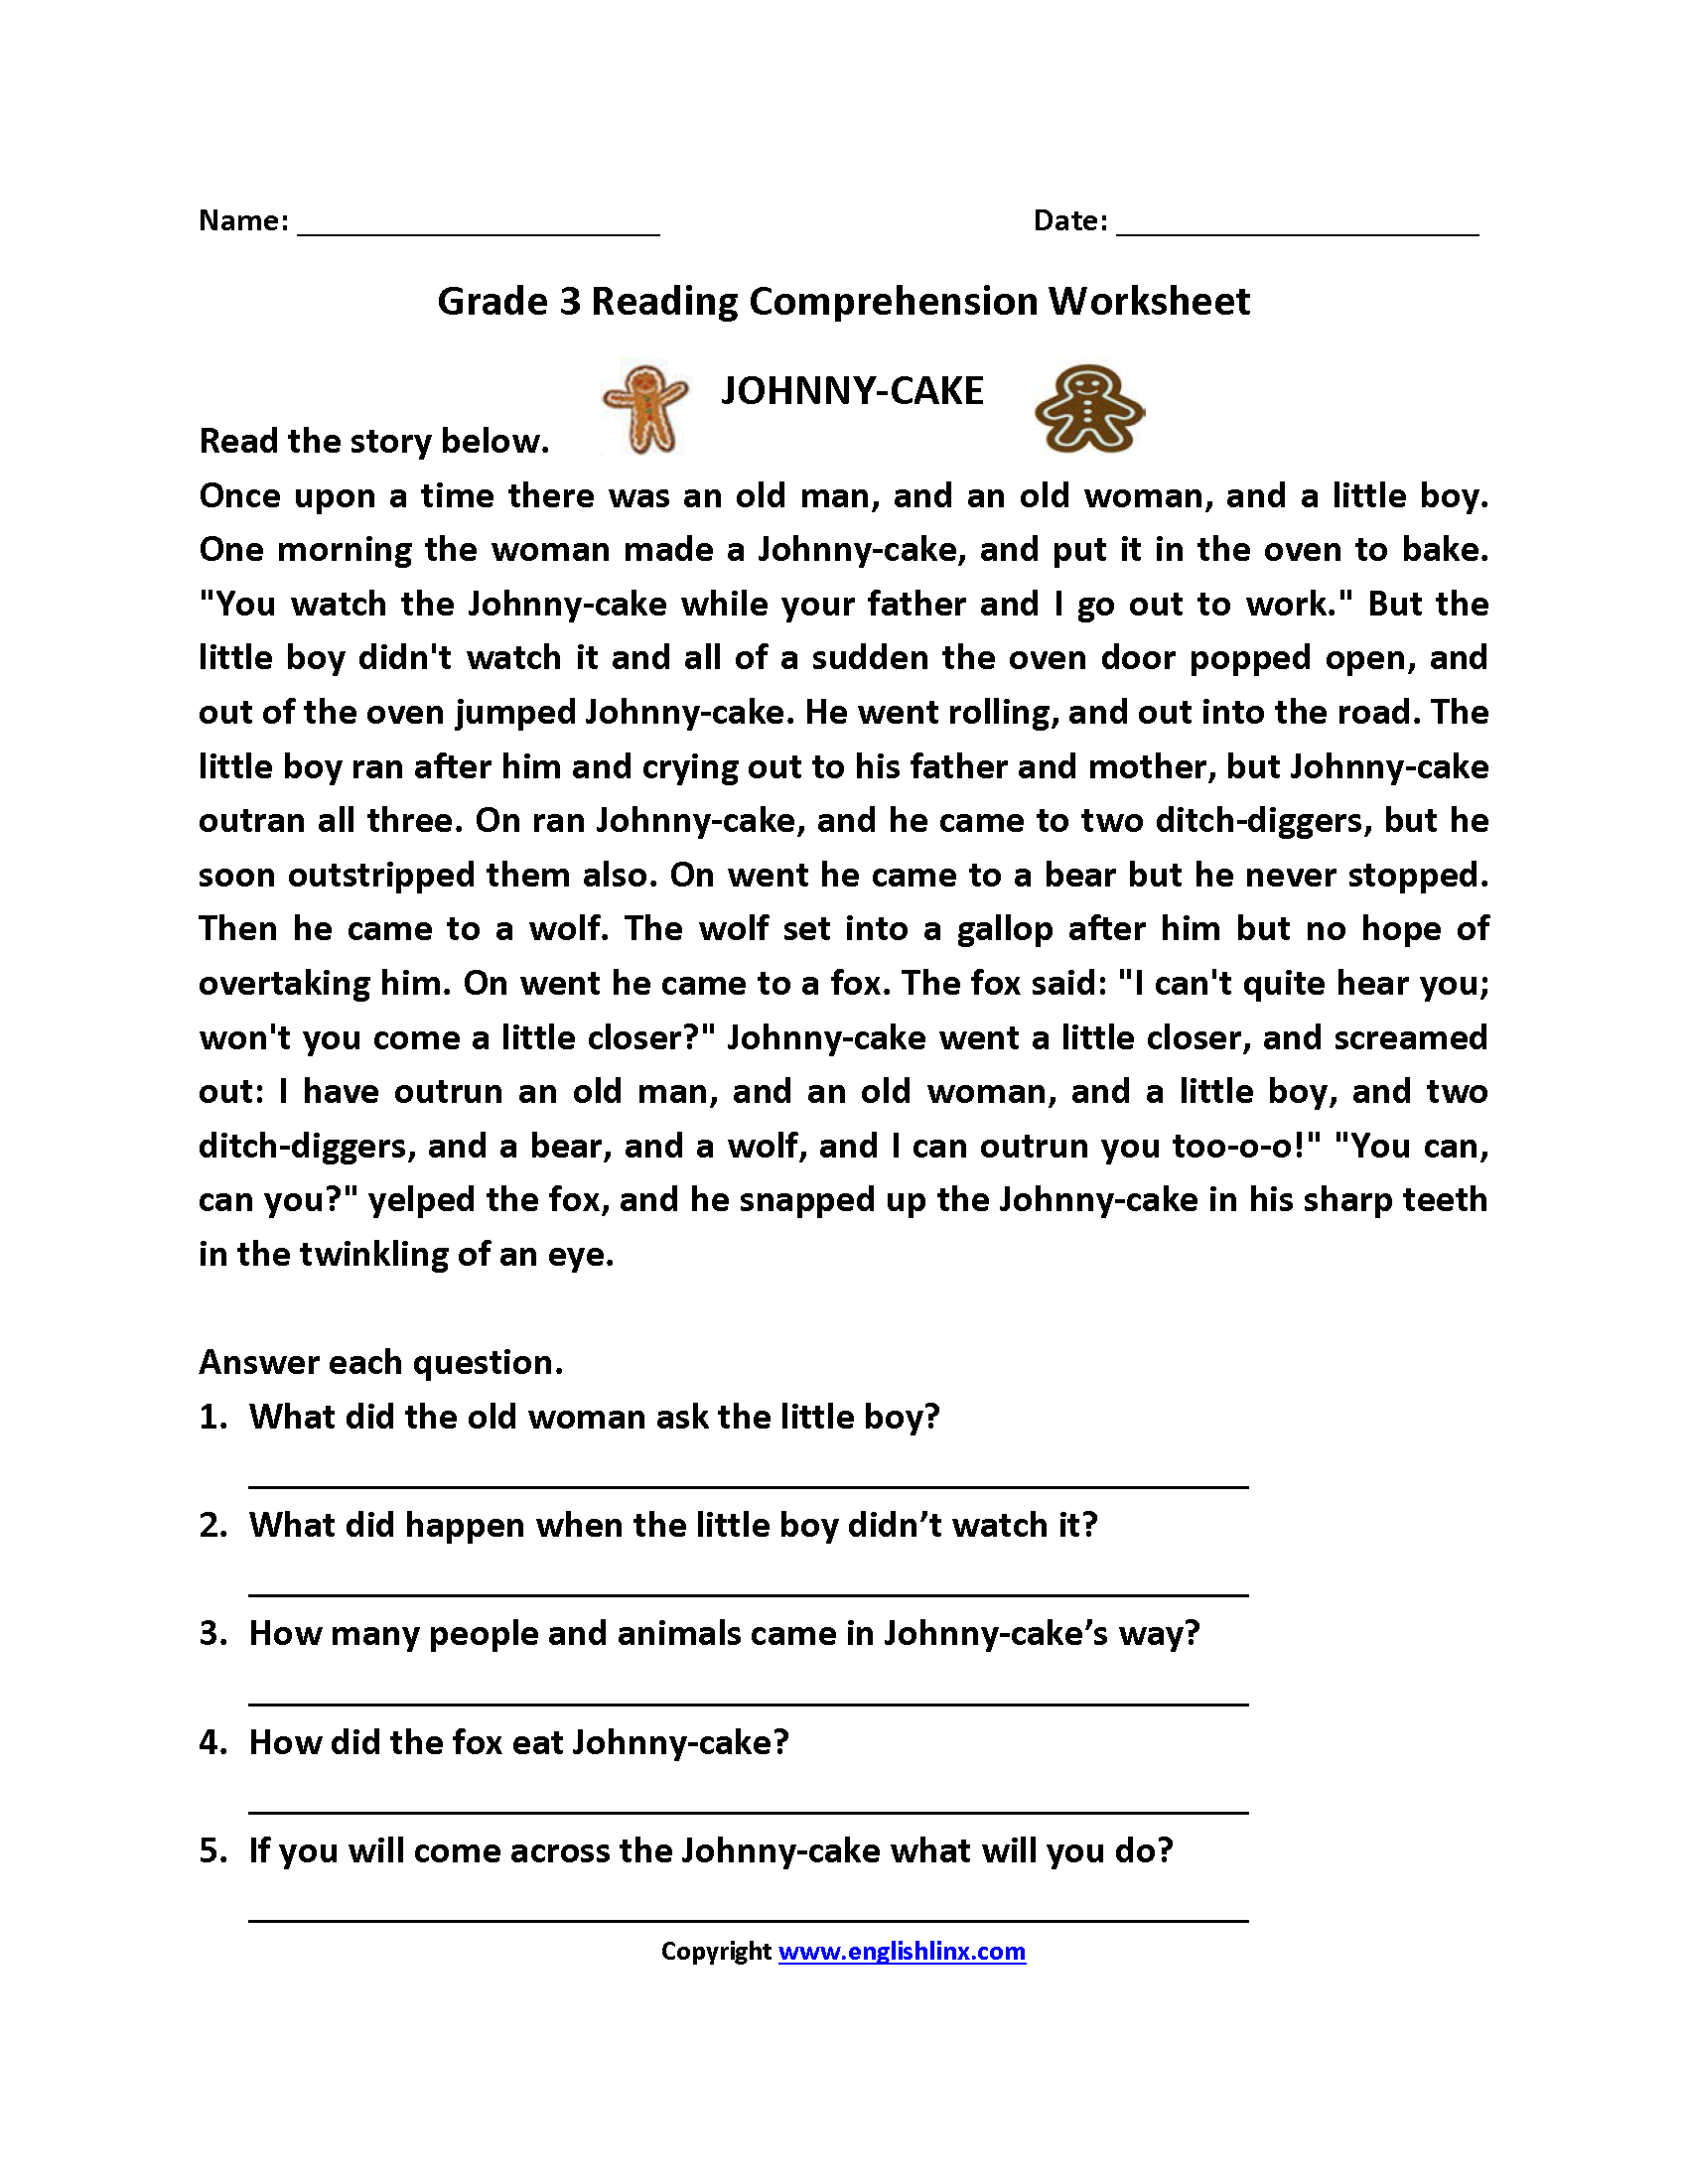 Reading Worksheets   Third Grade Reading Worksheets - Free Printable Reading Comprehension Worksheets For 3Rd Grade